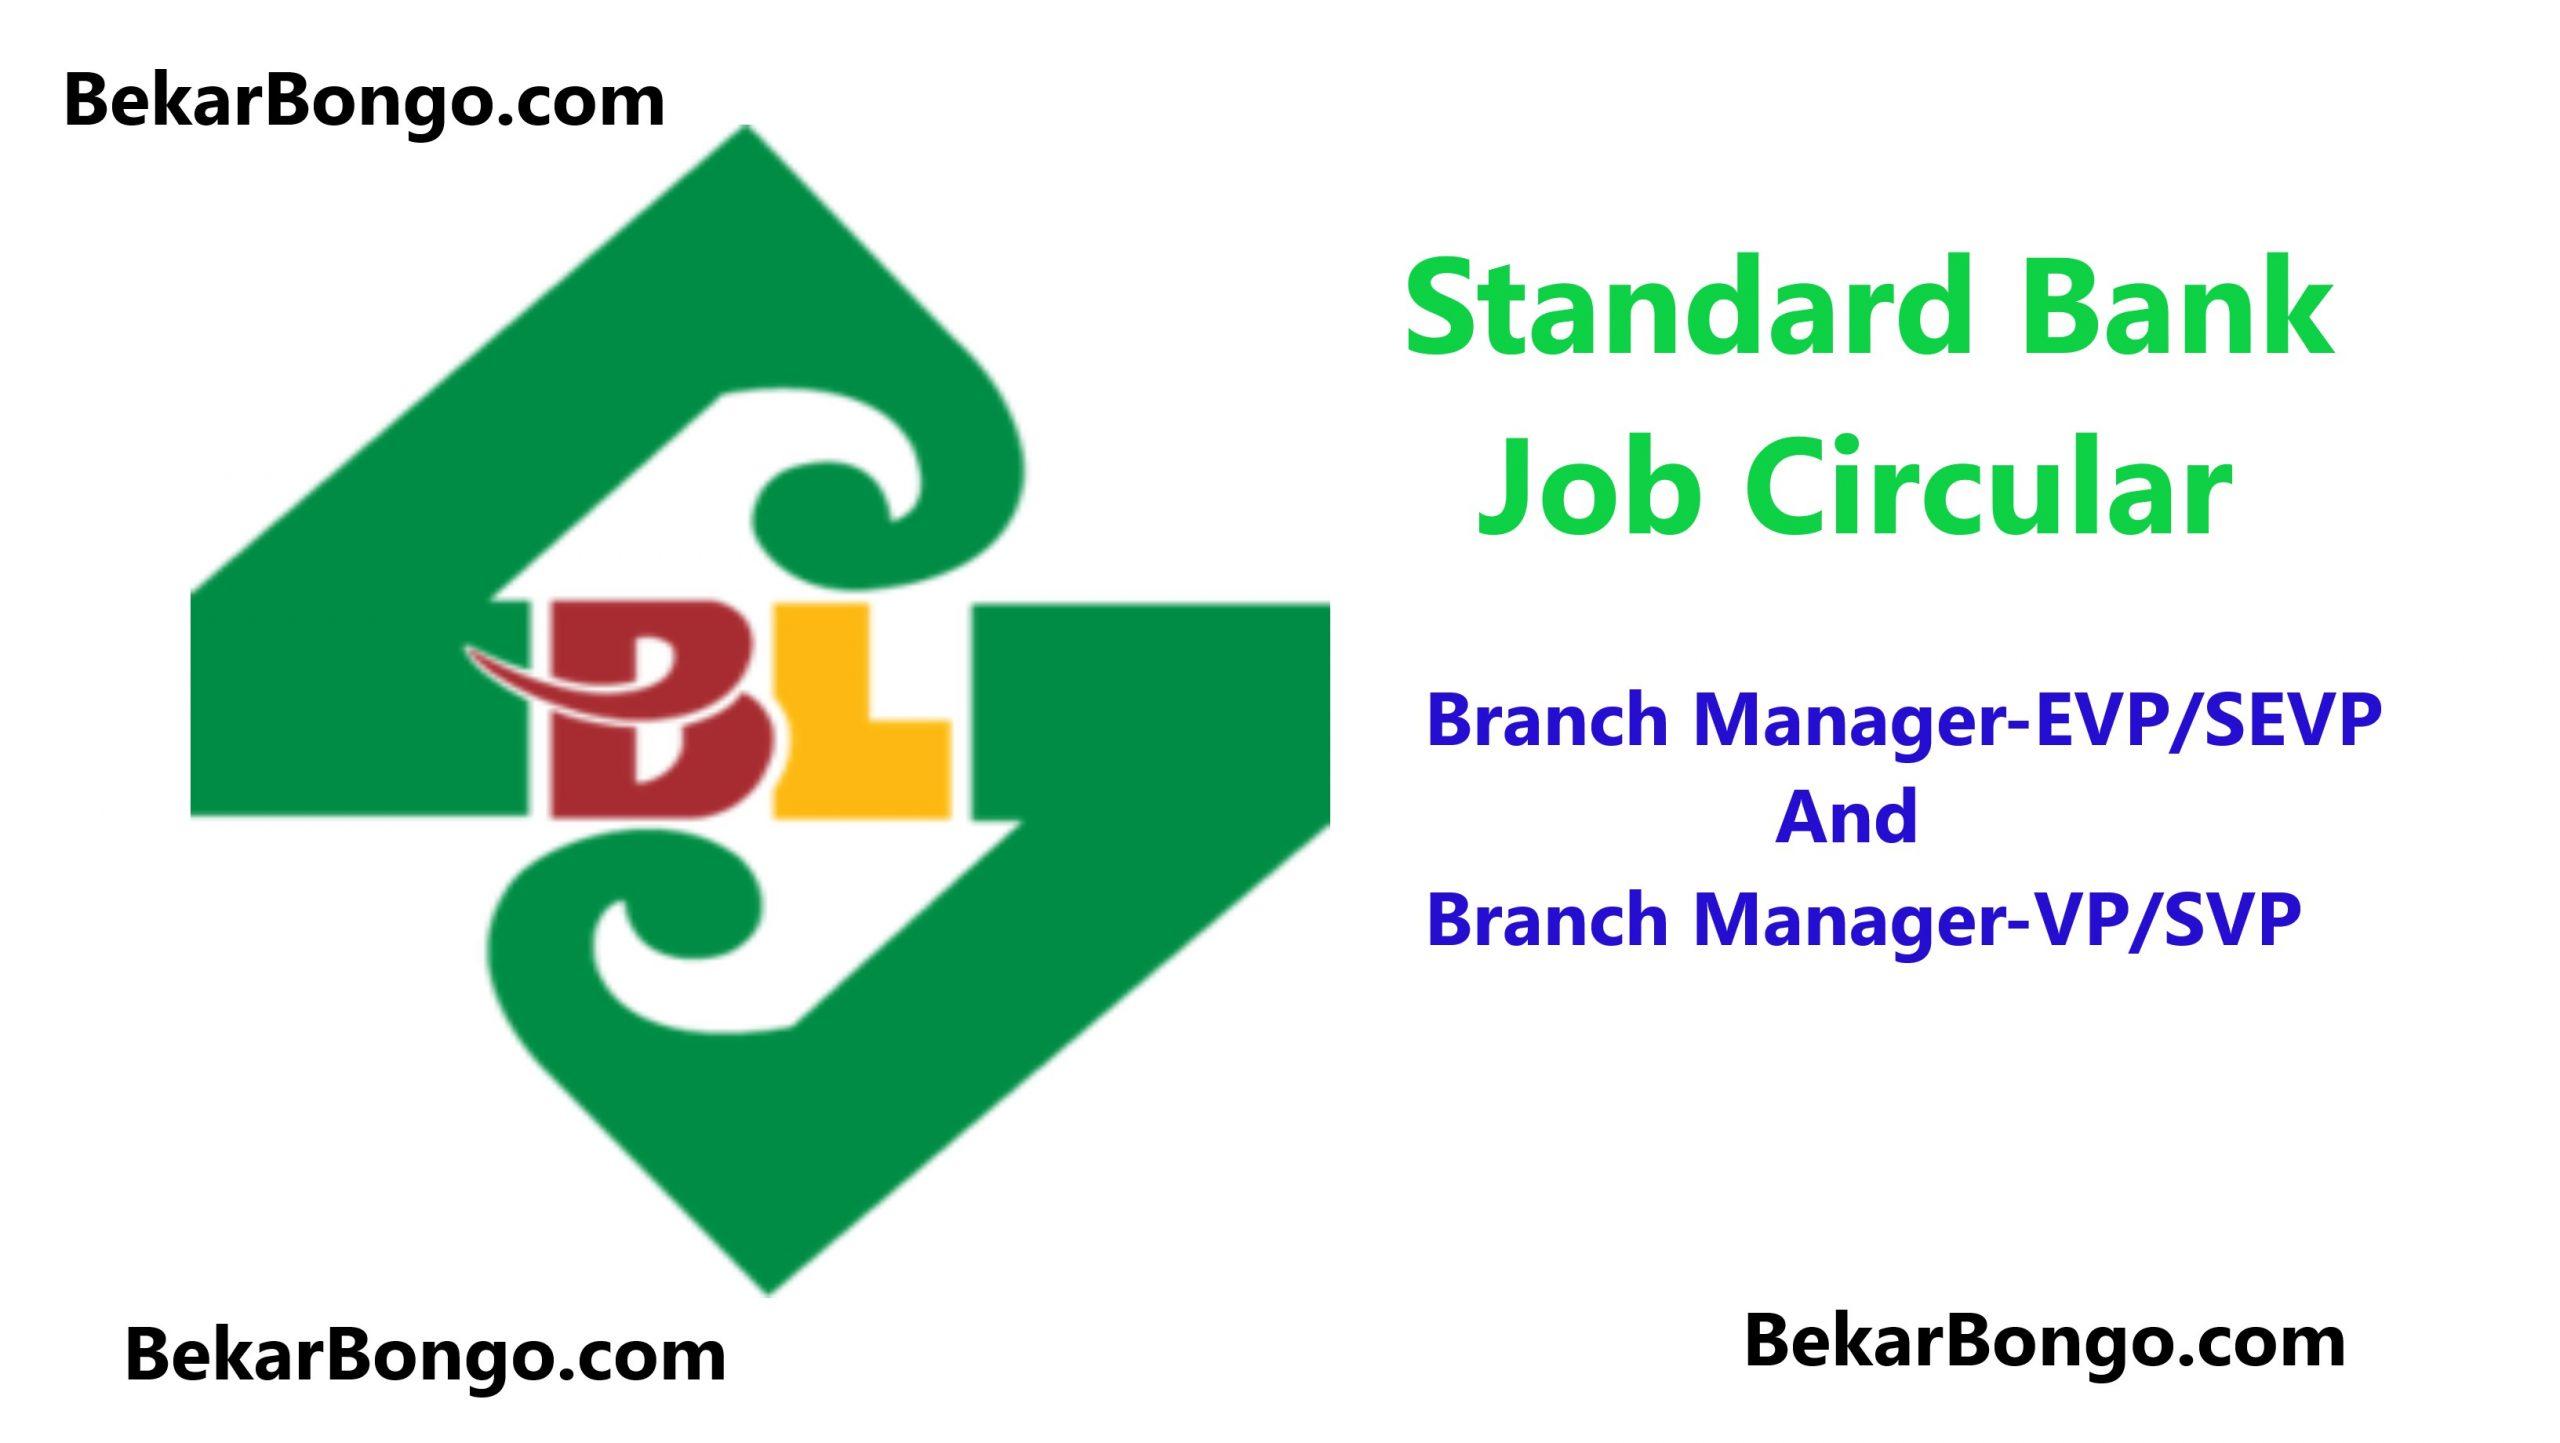 Standard Bank Ltd Job circular 2019